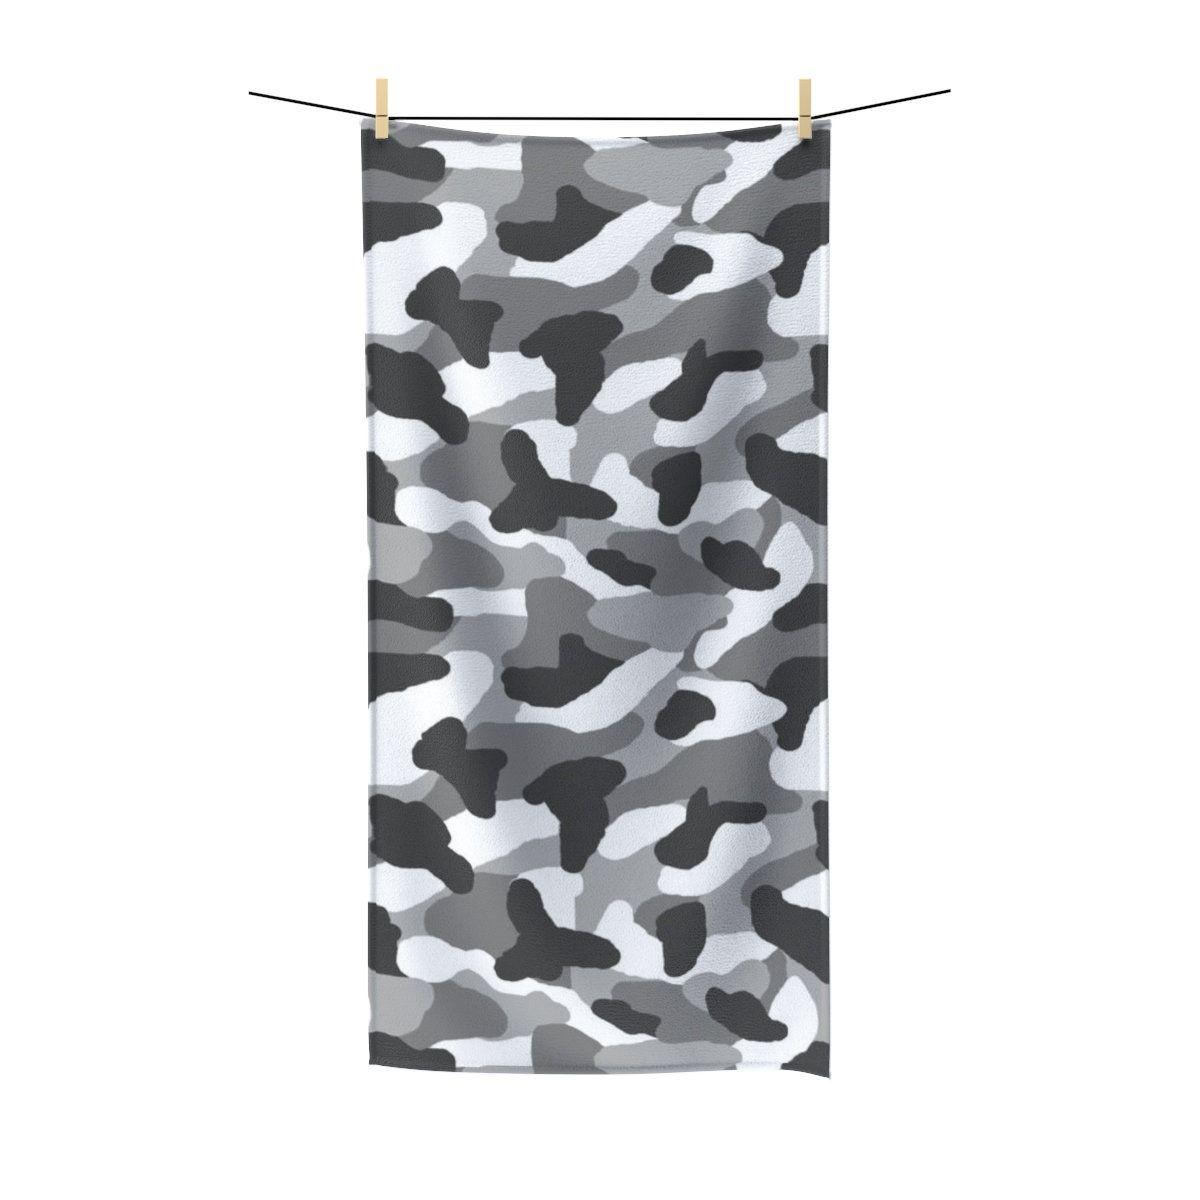 Camo Bath Towel Gray Grey Camouflage Beach Bathroom Polycotton